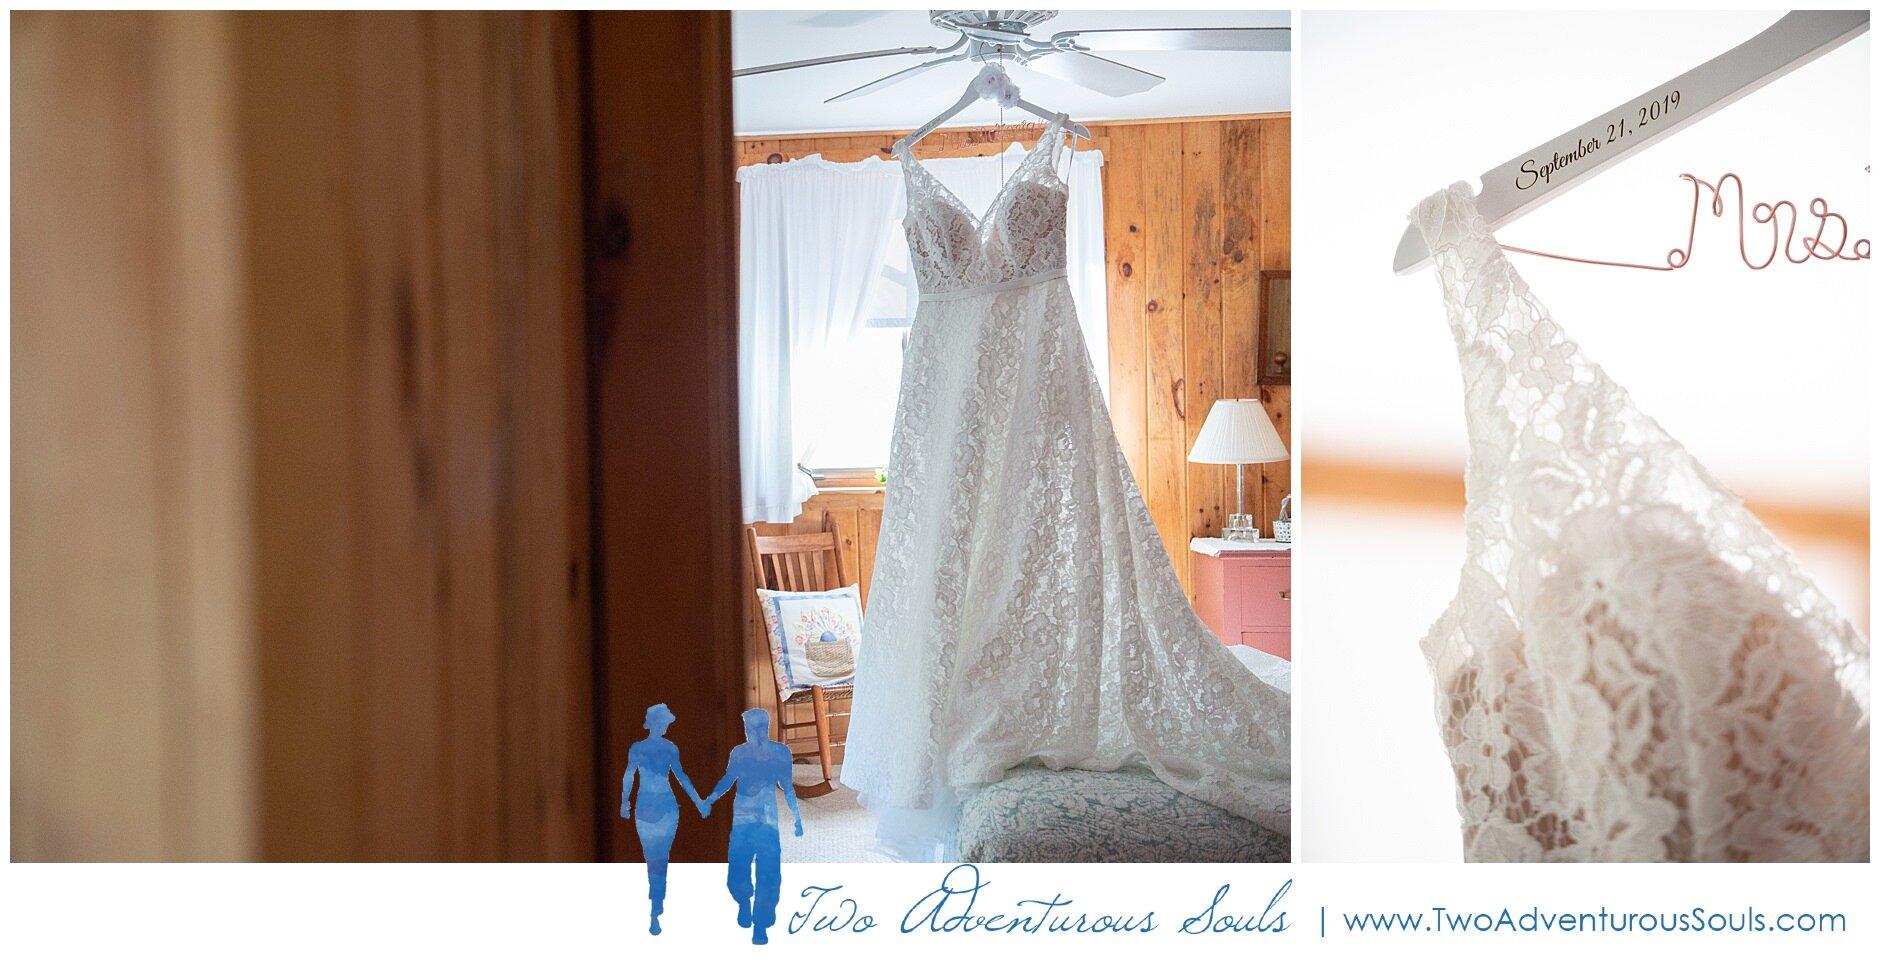 Breakwater Inn and Spa Wedding Photographers, Kennebunkport Wedding Photographers, Two Adventurous Souls- 092119_0008.jpg